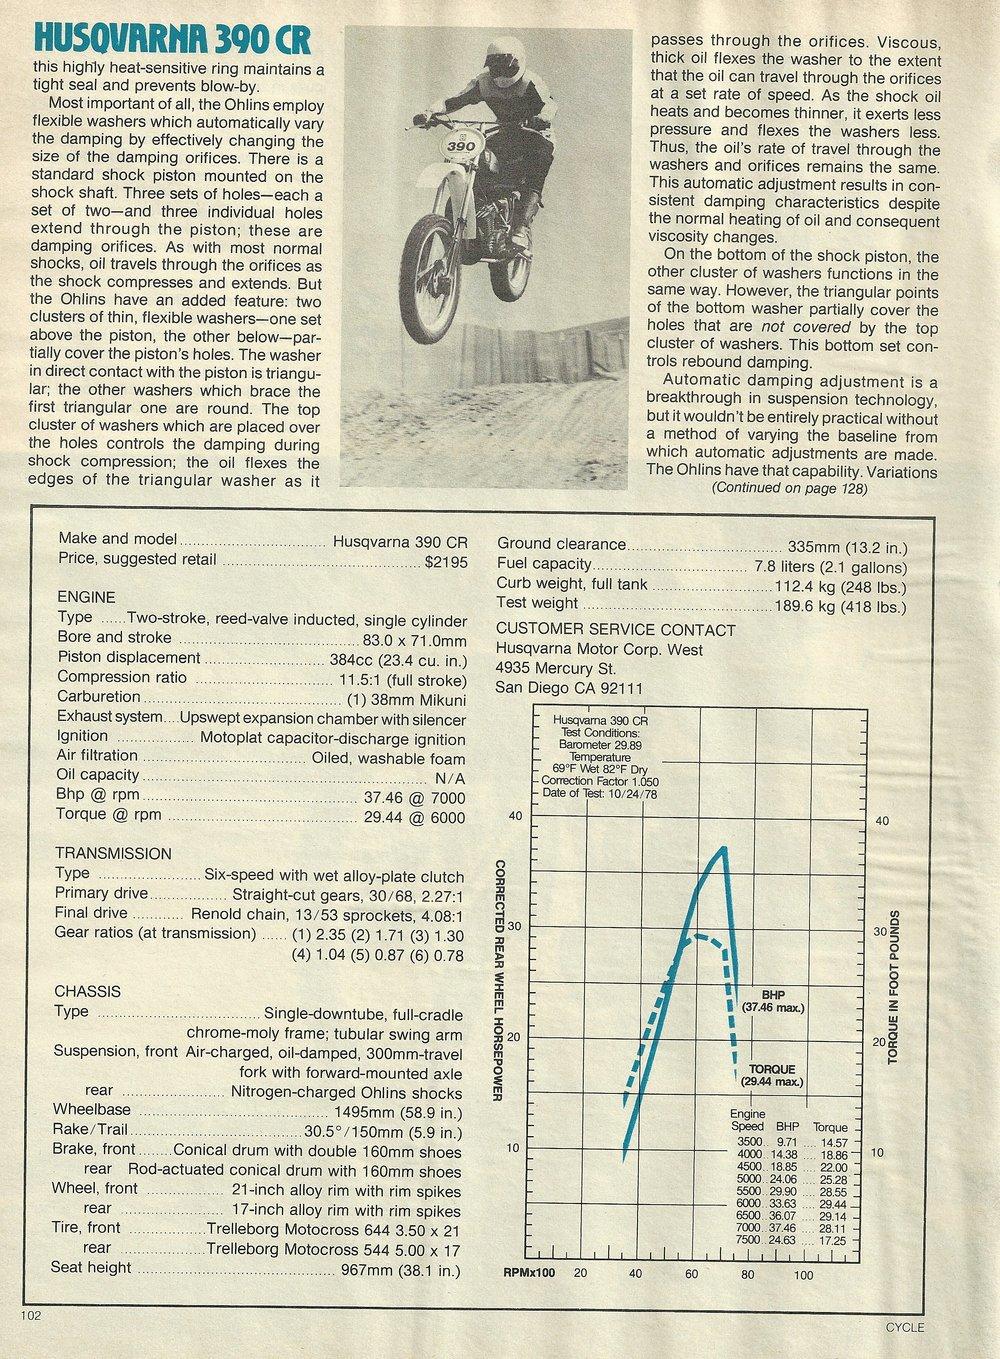 1979 Husqvarna 390 CR off road test 5.JPG